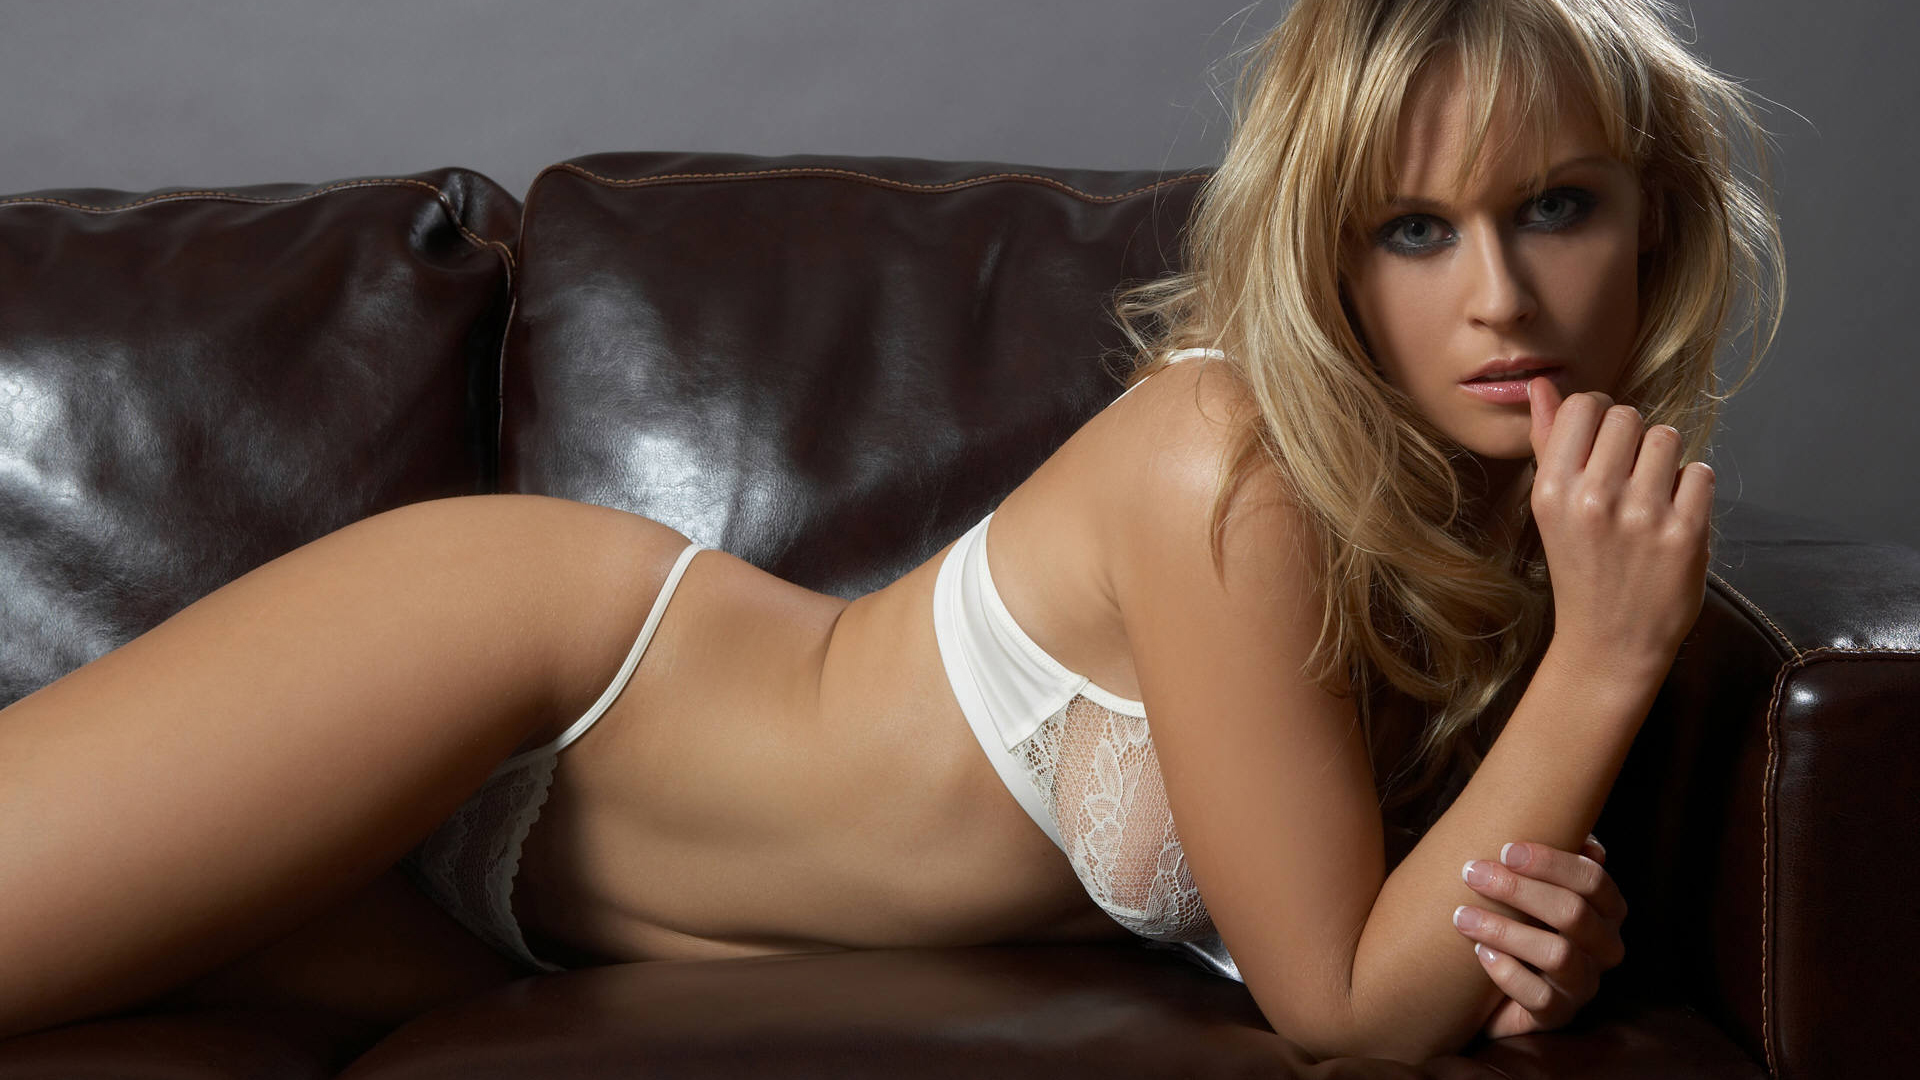 Carly rae jepsen nude uncensored